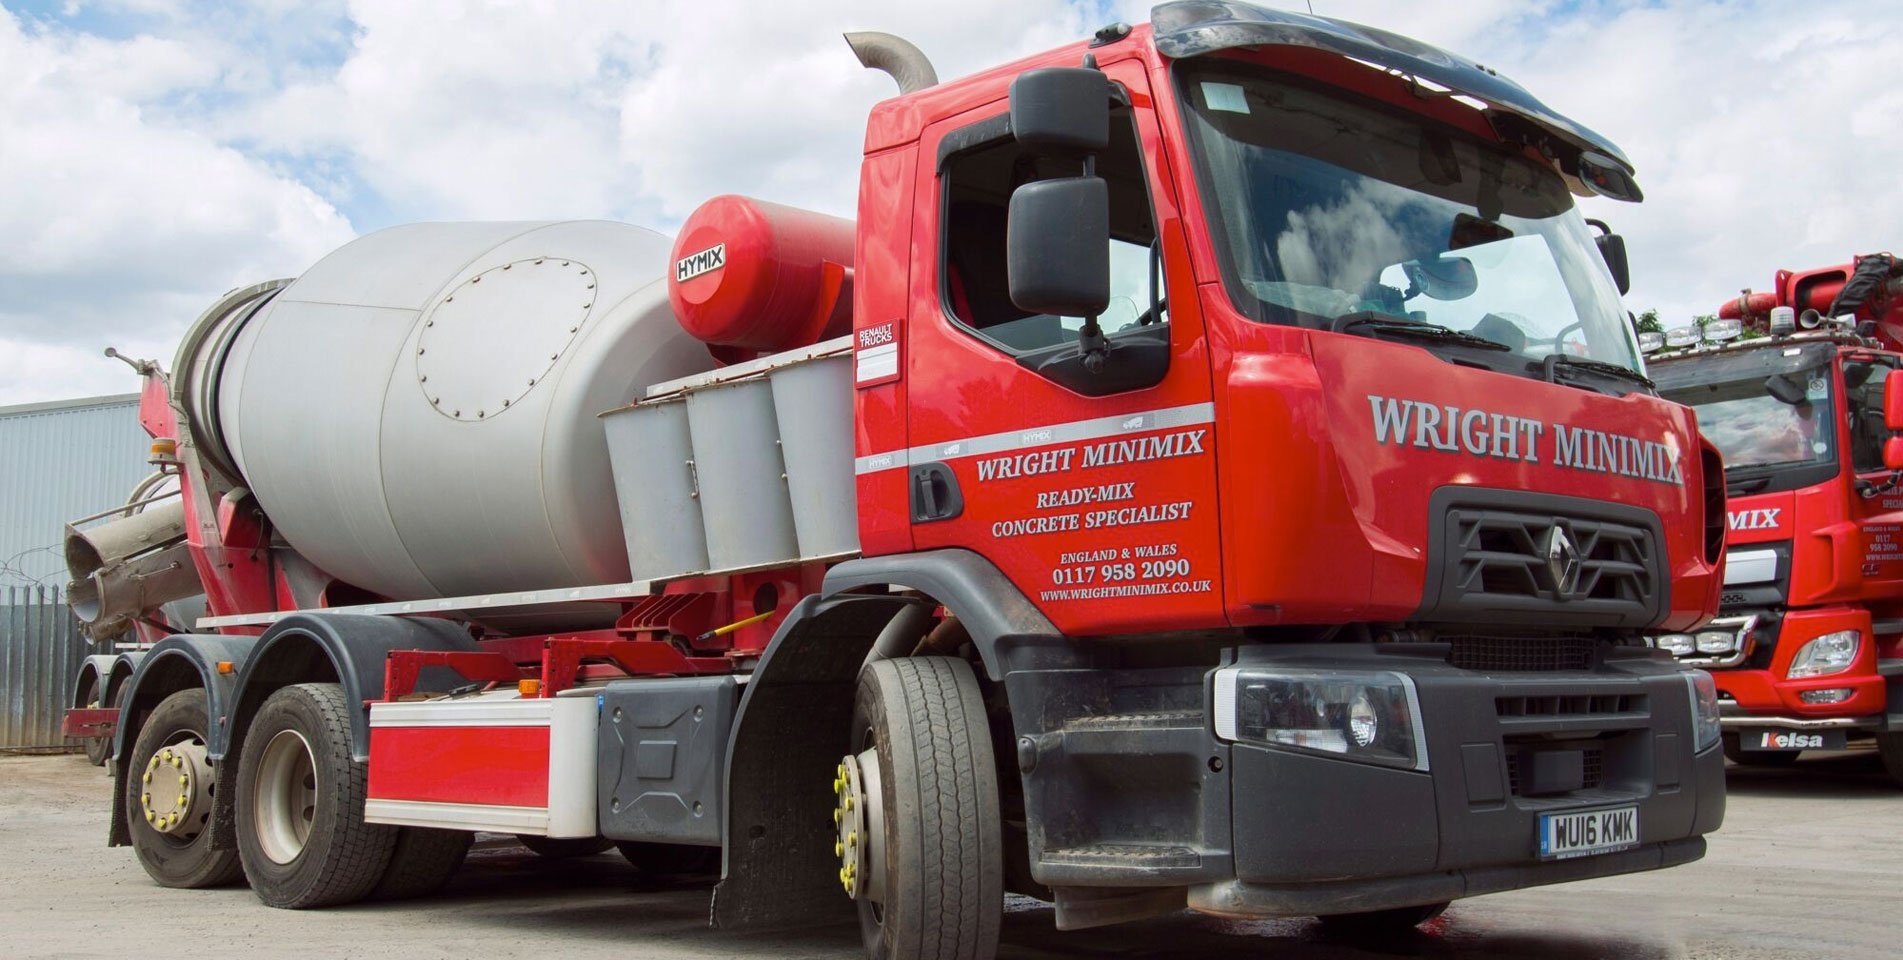 Ready Mix Concrete, Screed & Concrete Pump Suppliers